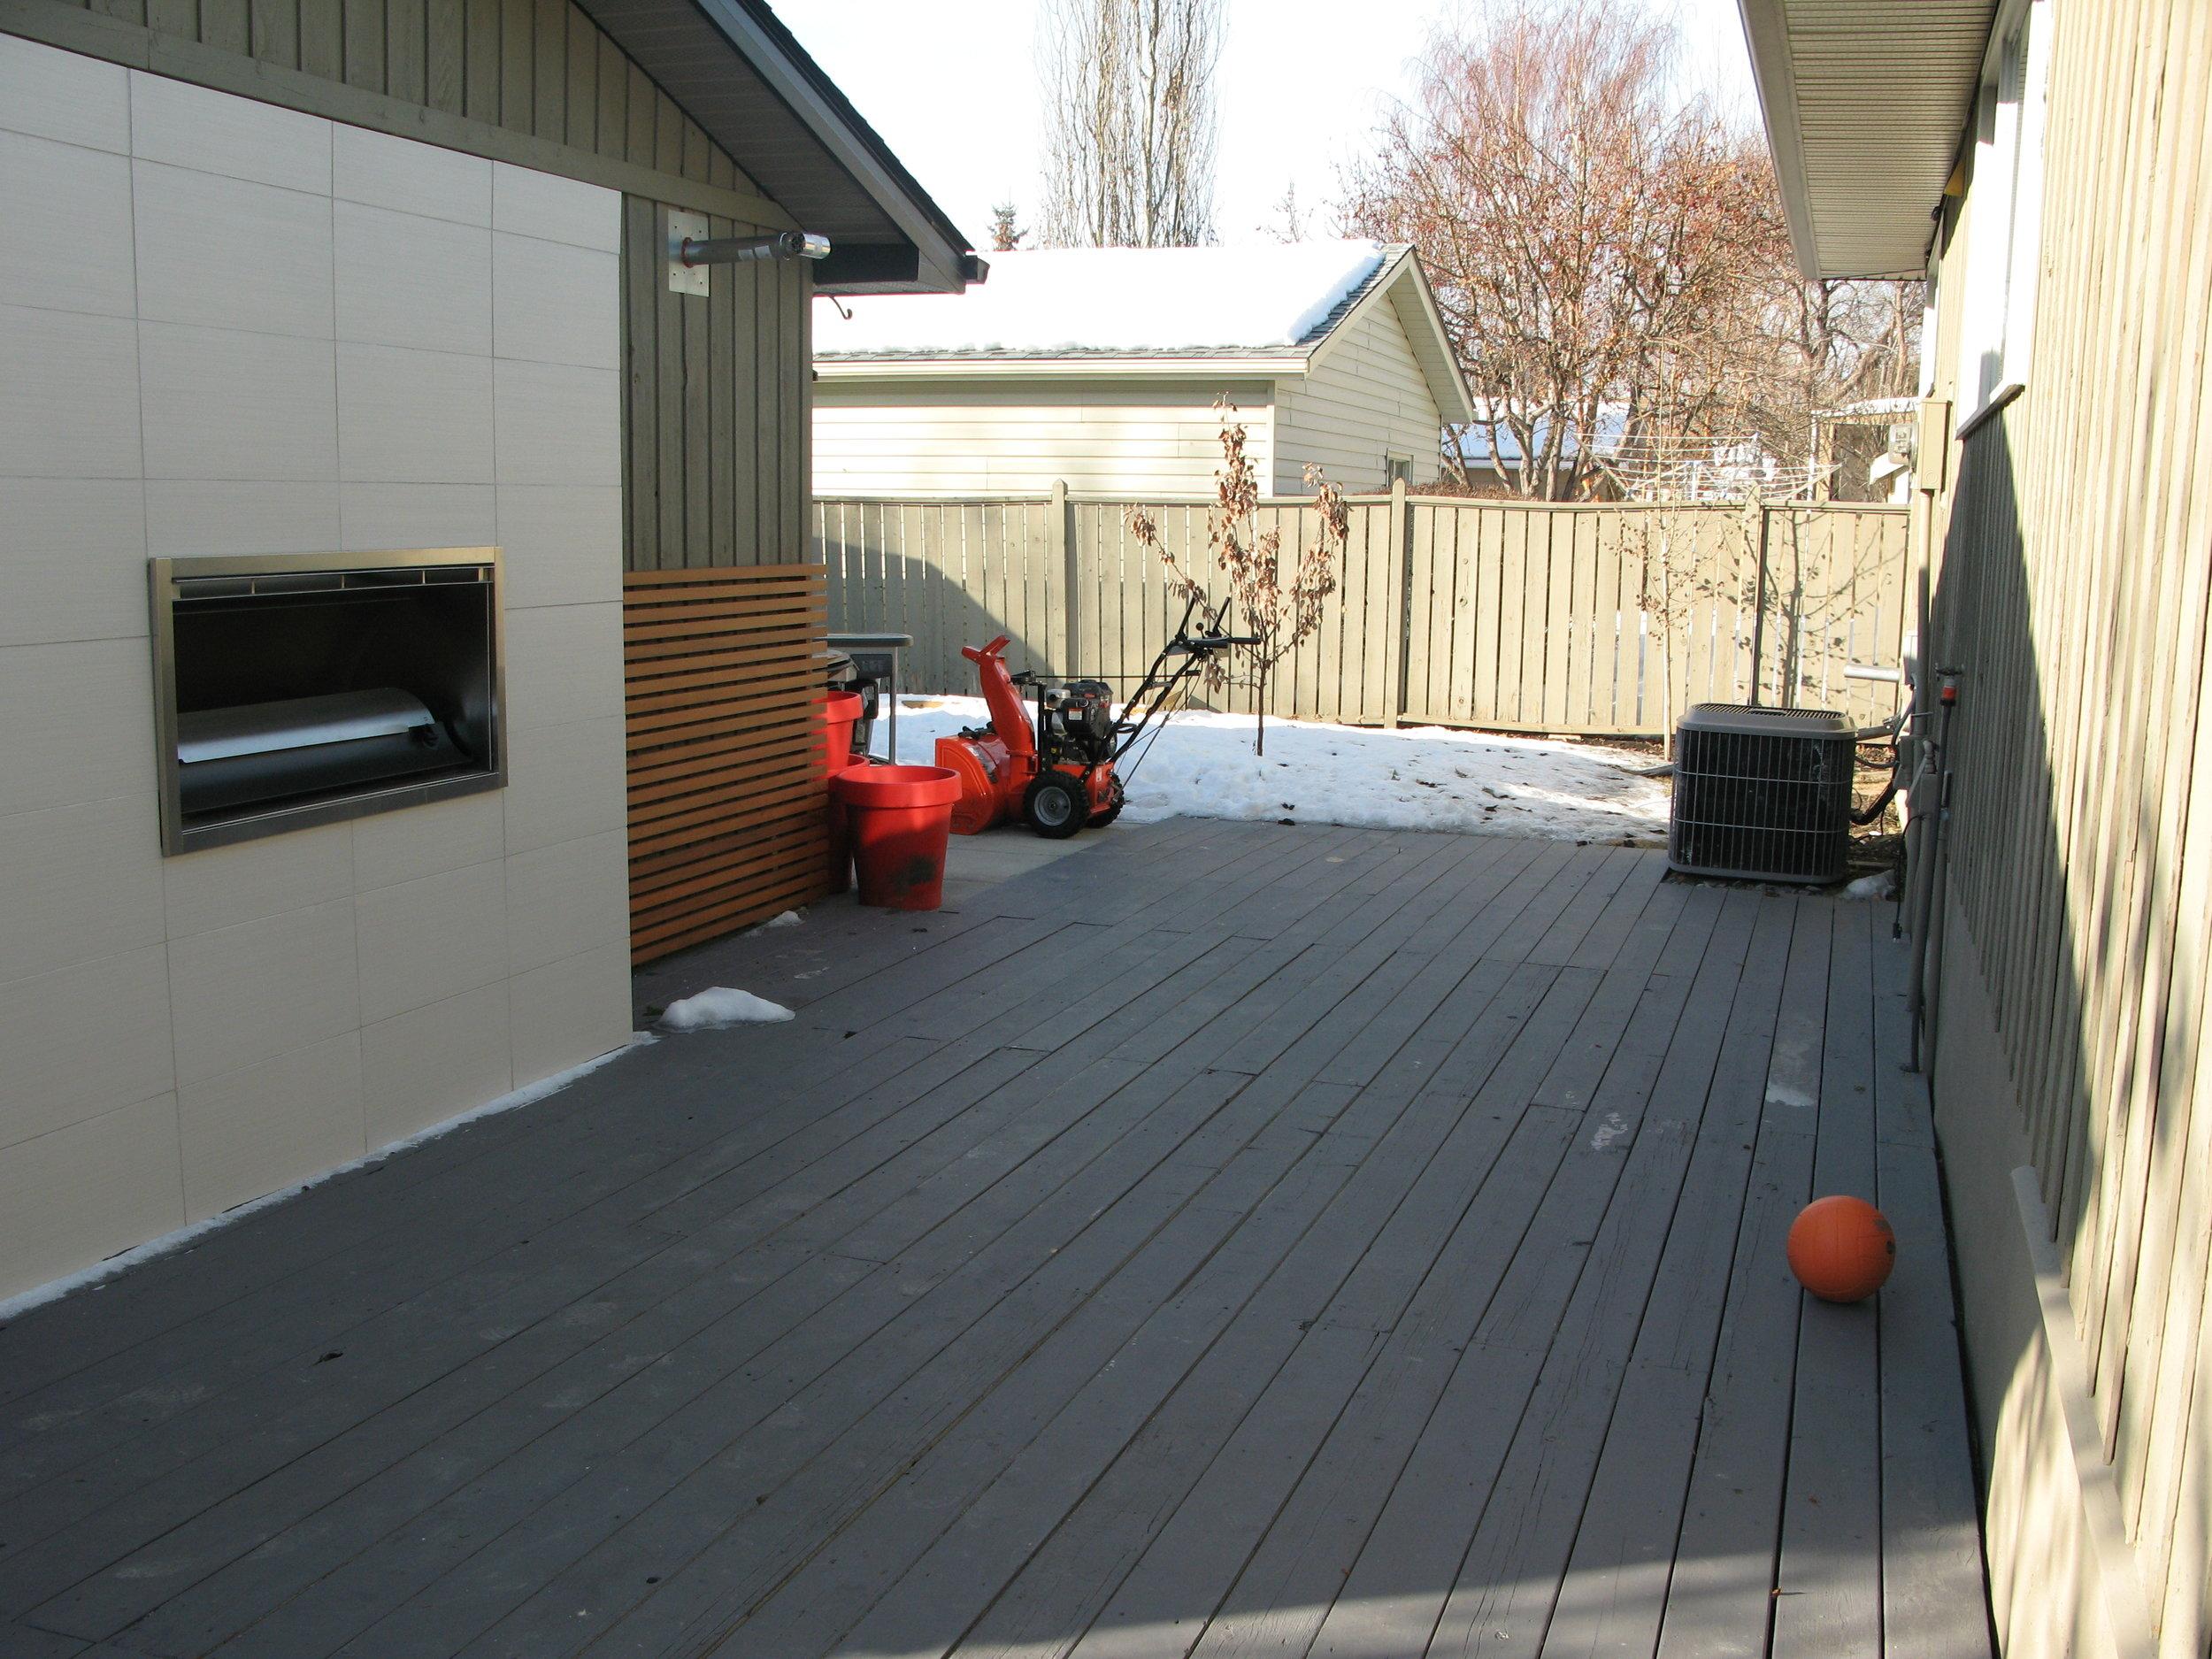 backyard before (home 1)